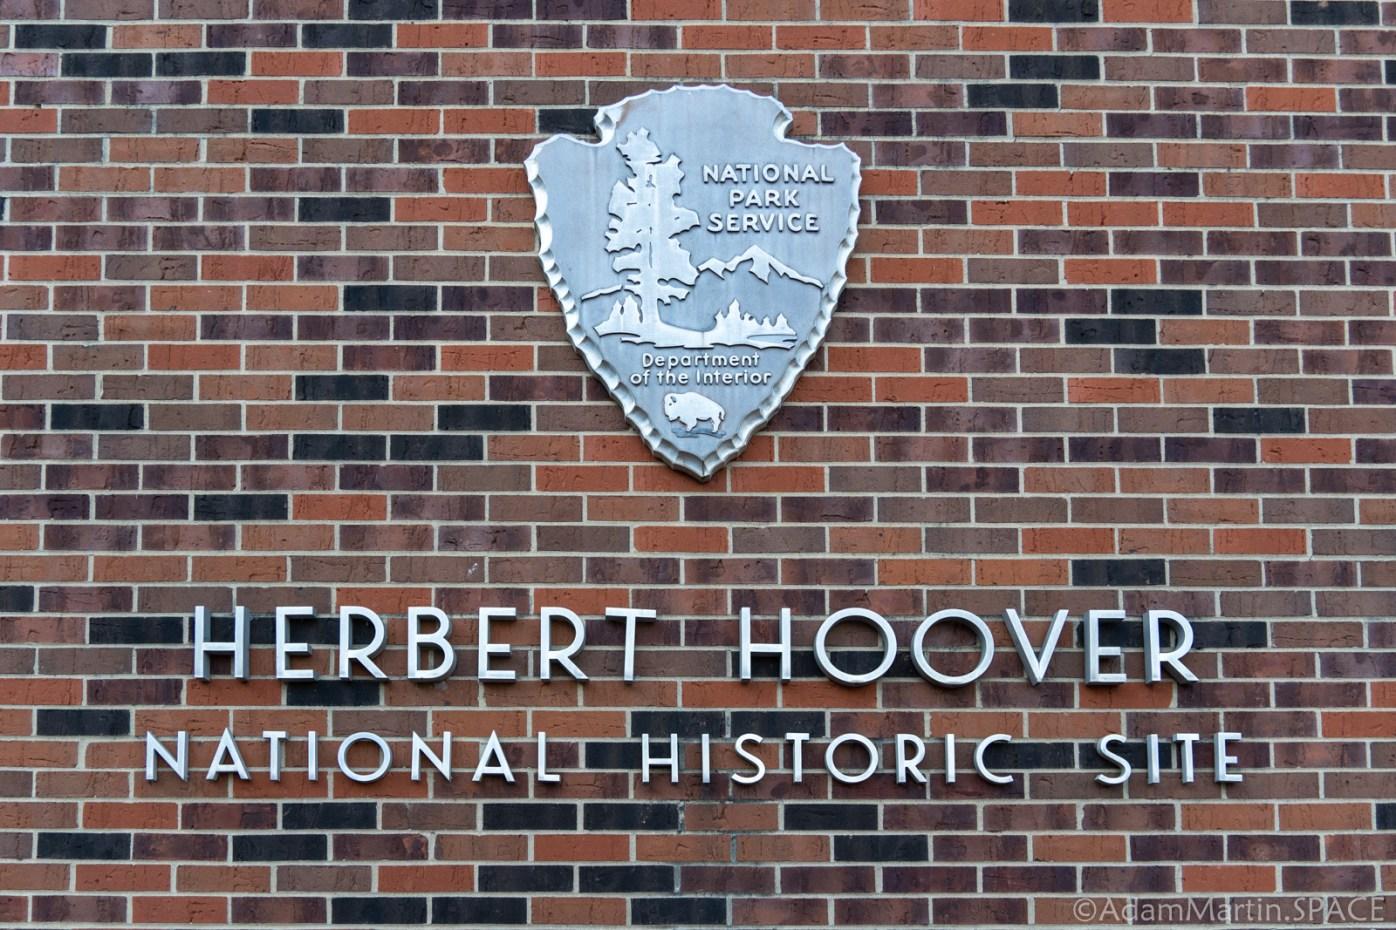 Herbert Hoover National Historic Site - NPS Building Sign